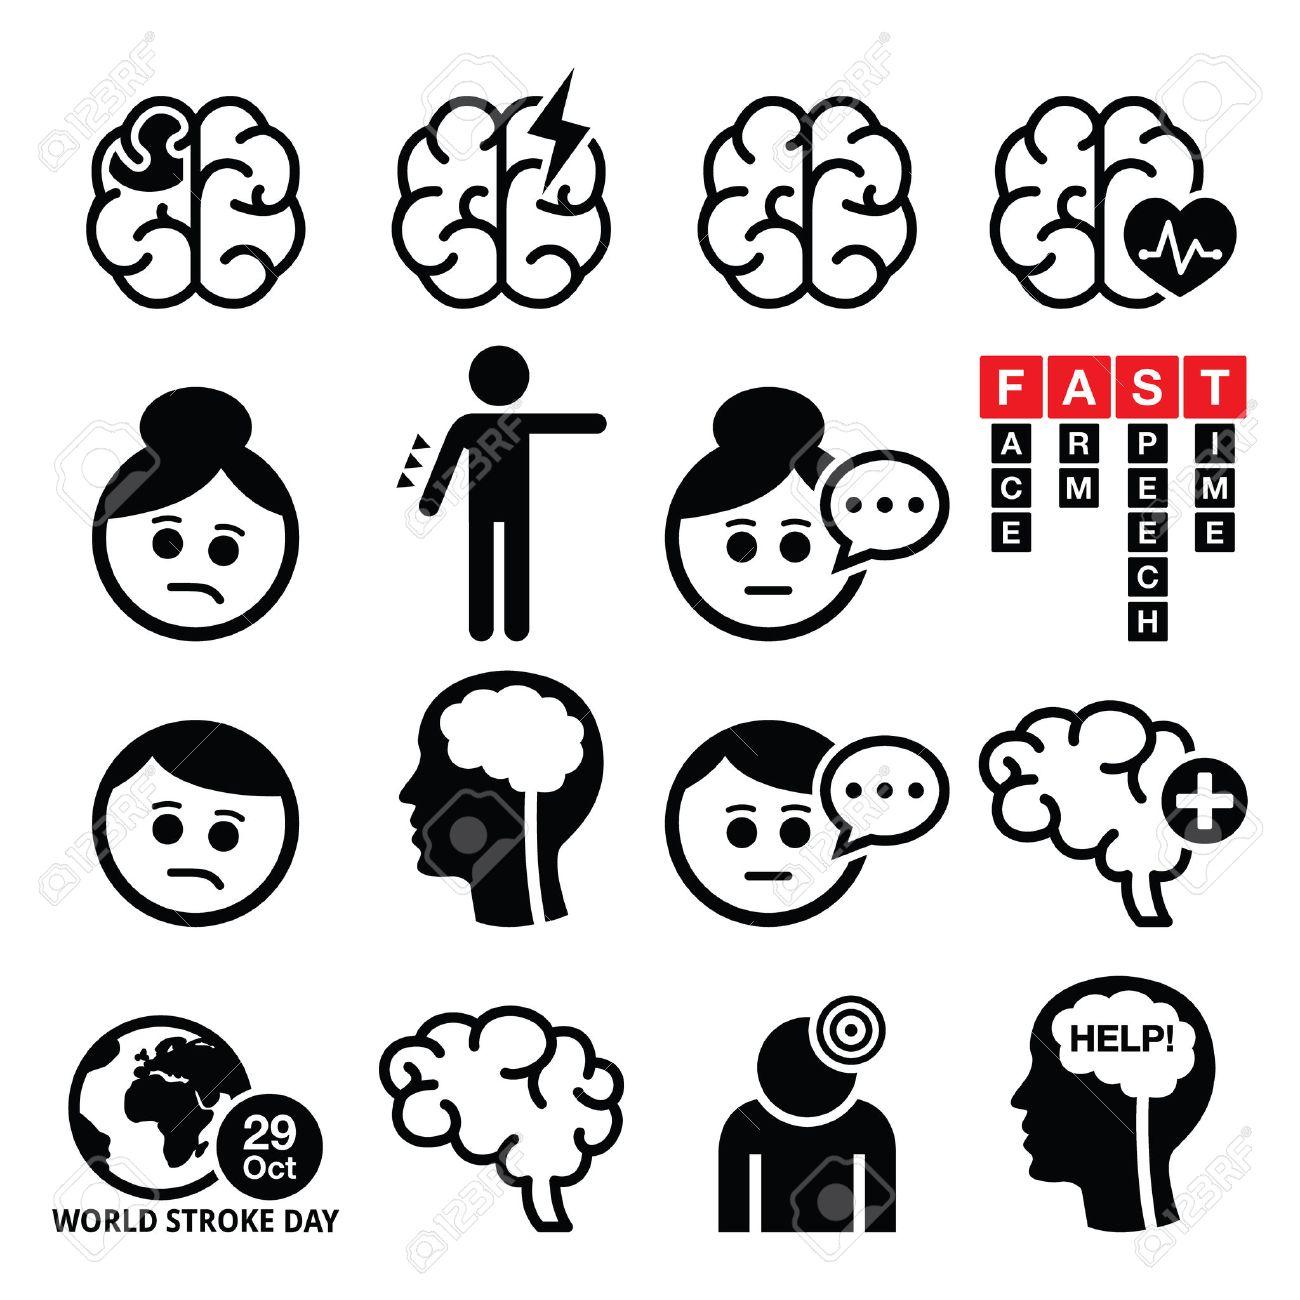 Brain stroke icons - brain injury, brain damage concept - 52184727